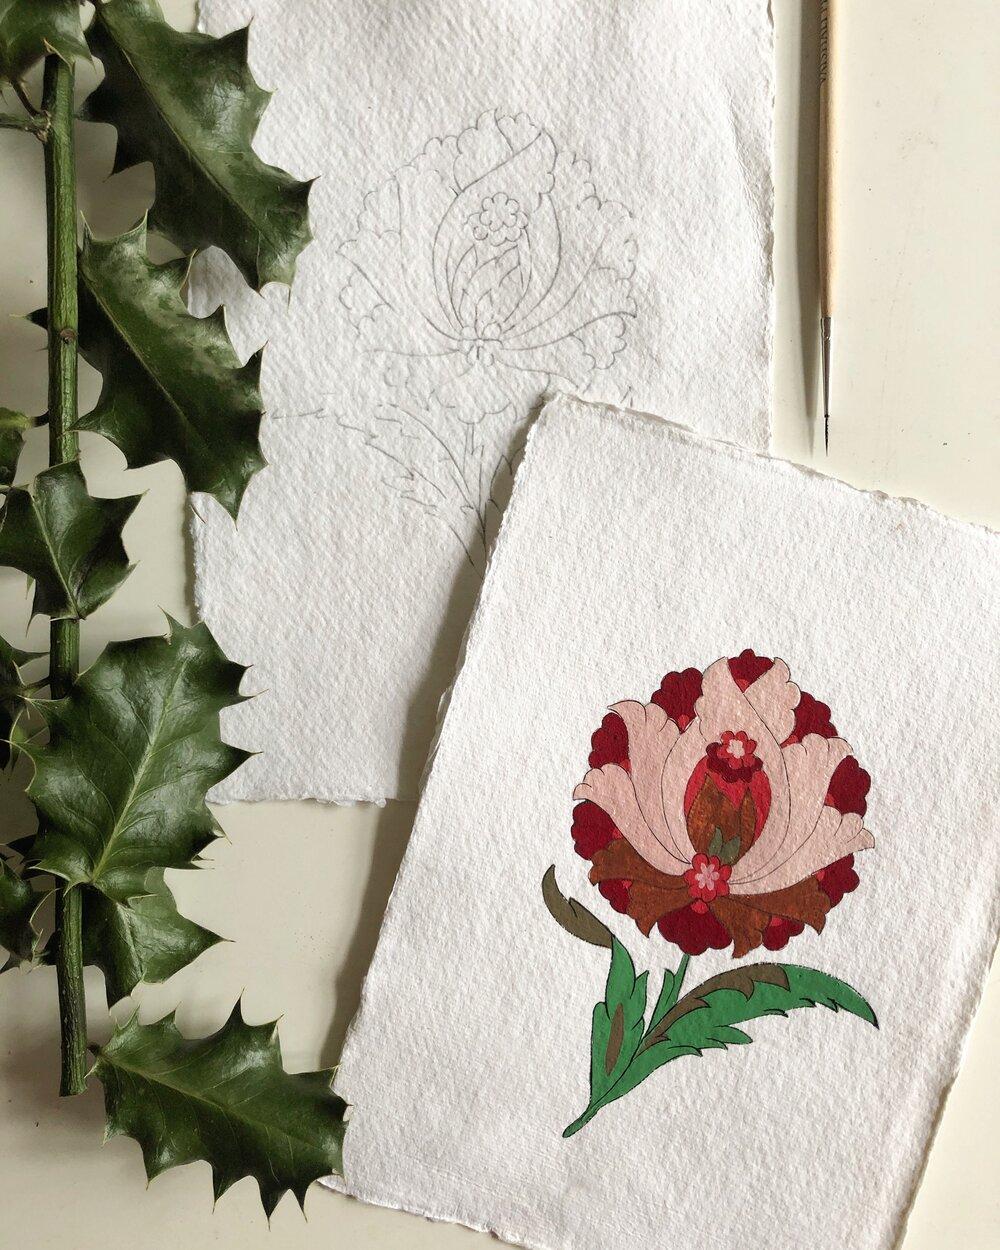 A painting in progress from Esra's Turkish Flower Painting Workshop. Photo: @i slamicillumination